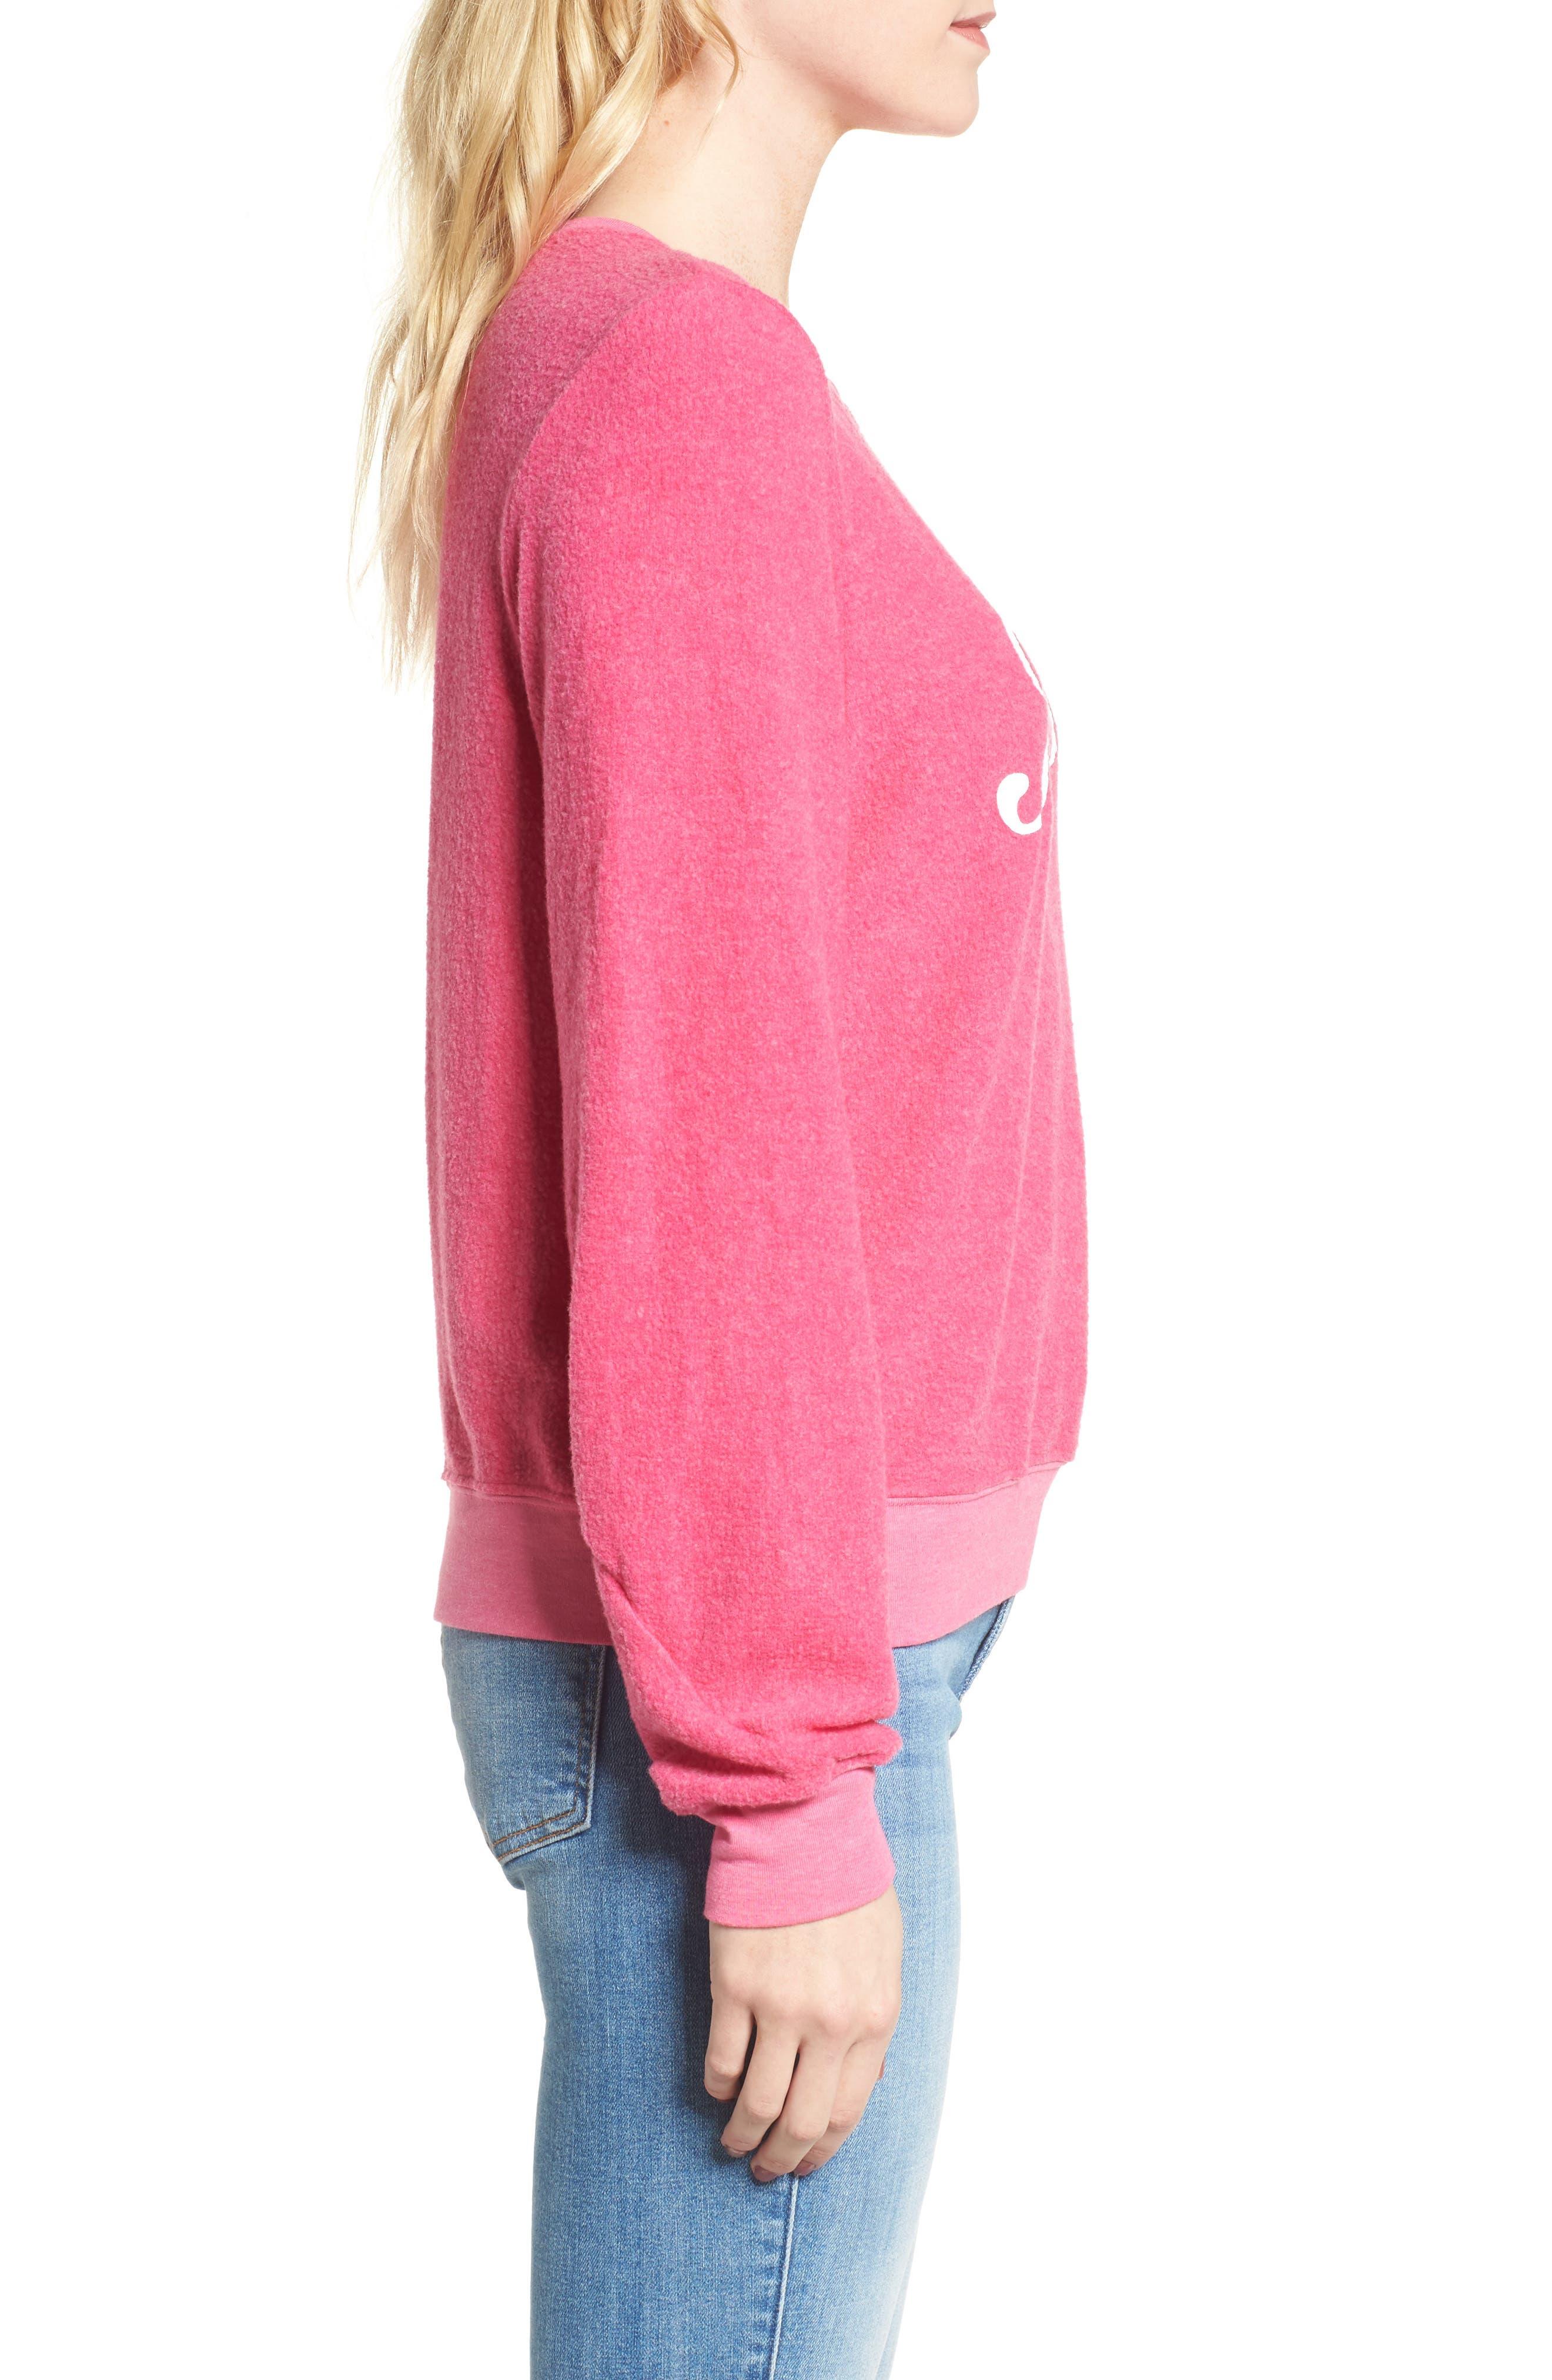 Jet Lagged Sweatshirt,                             Alternate thumbnail 3, color,                             Malibu Pink